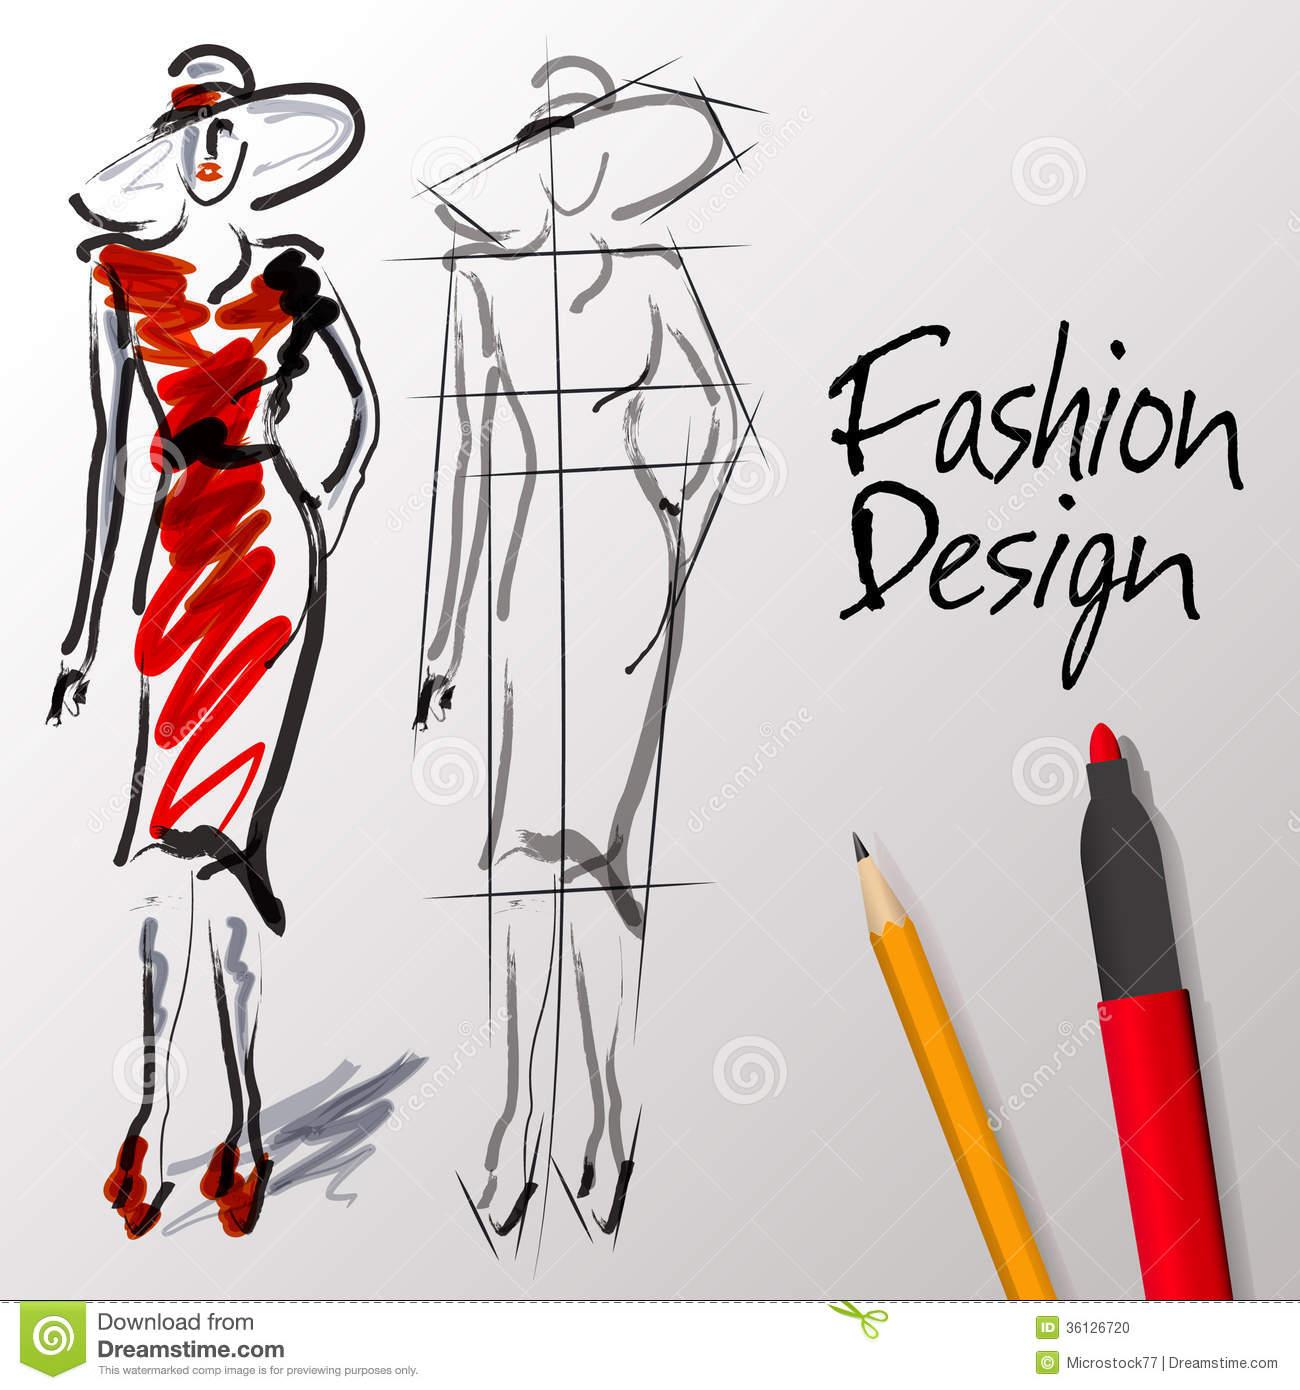 Fashion design clipart clip art free download Fashion design clipart 5 » Clipart Station clip art free download